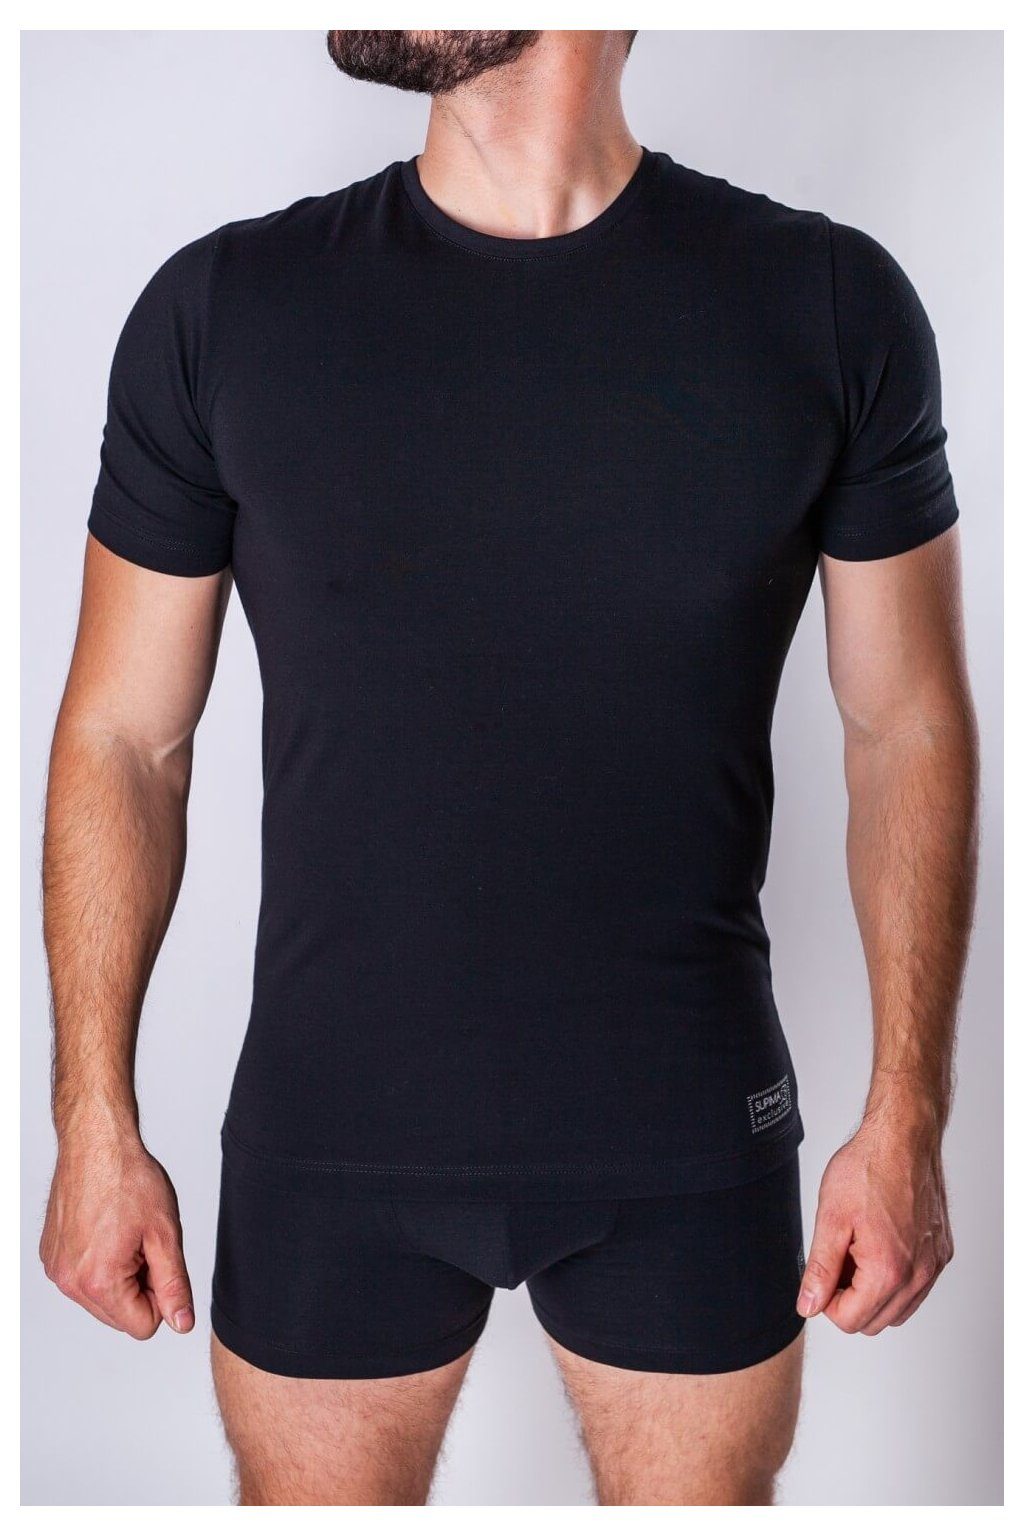 čierne tričko zo supimi